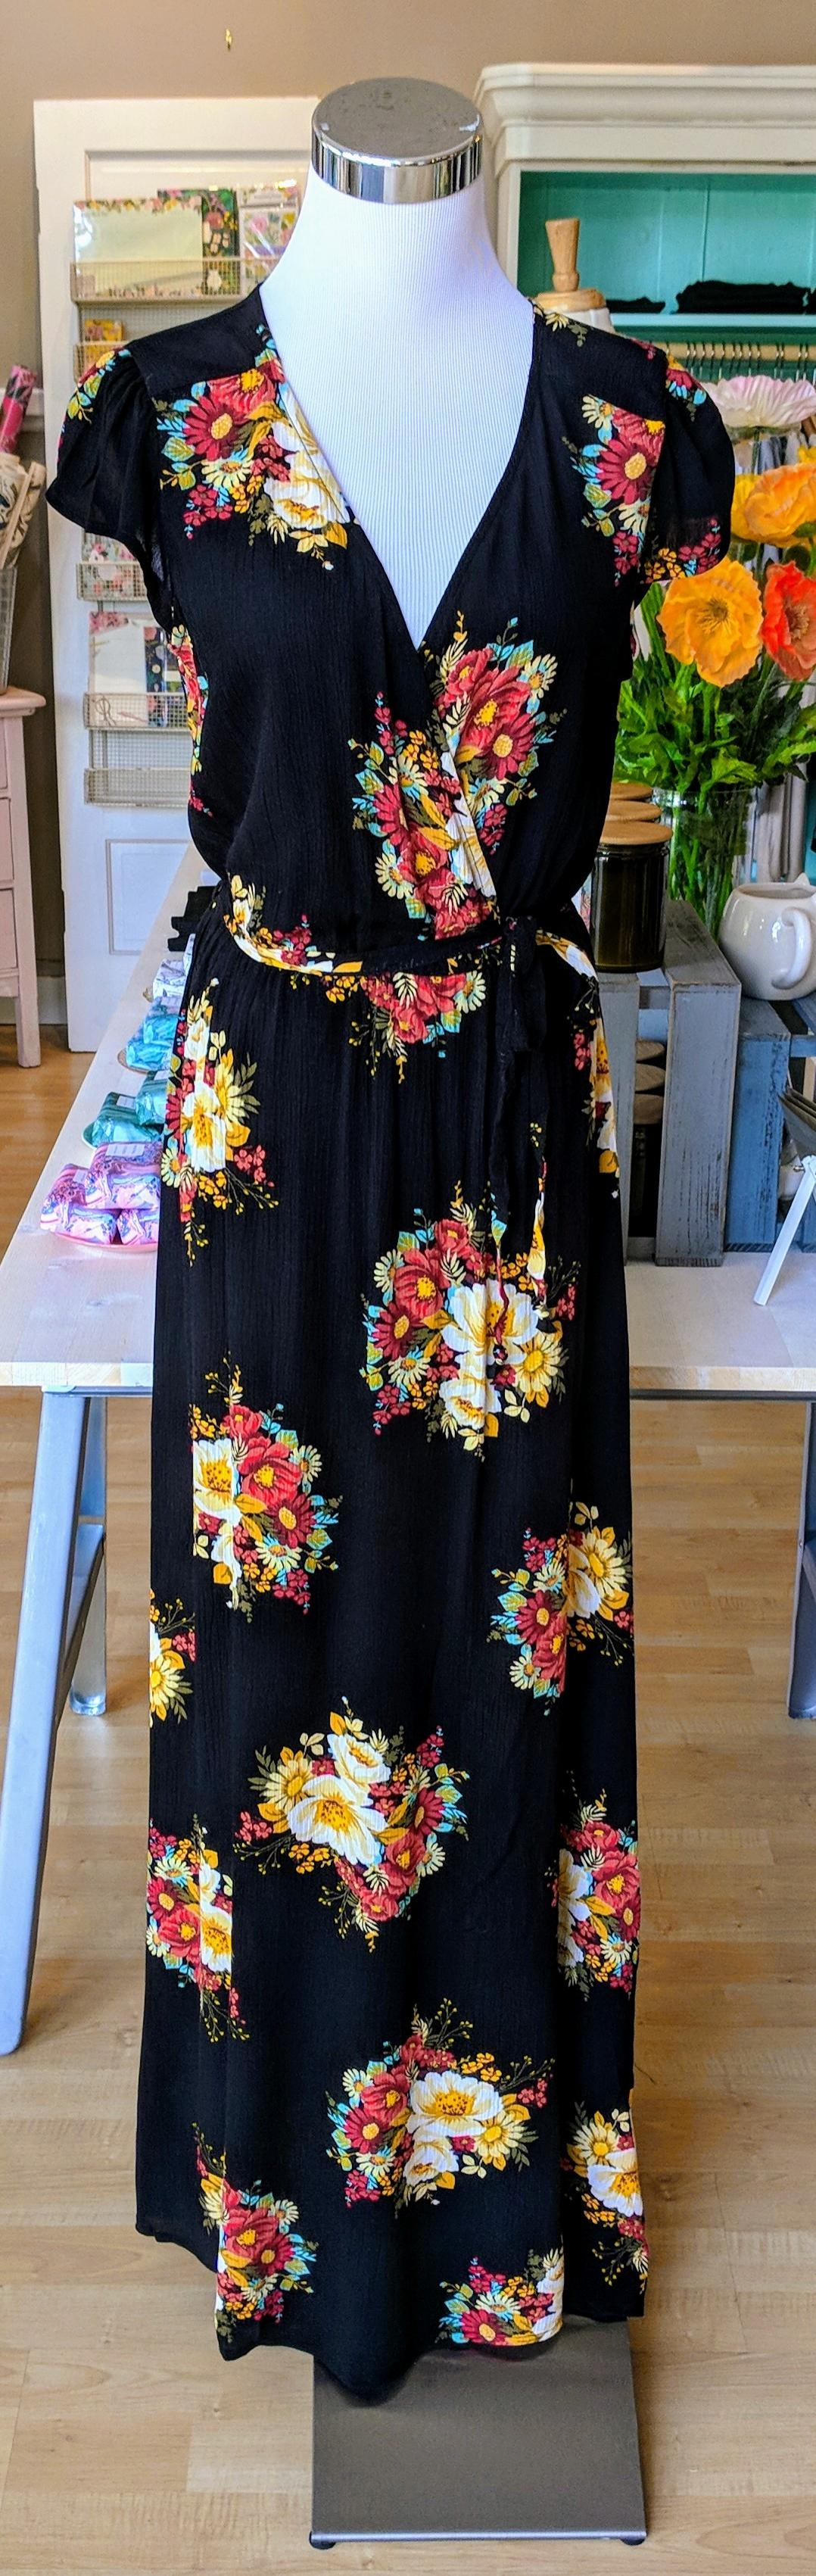 Black floral pattern maxi wrap dress with tie waist.